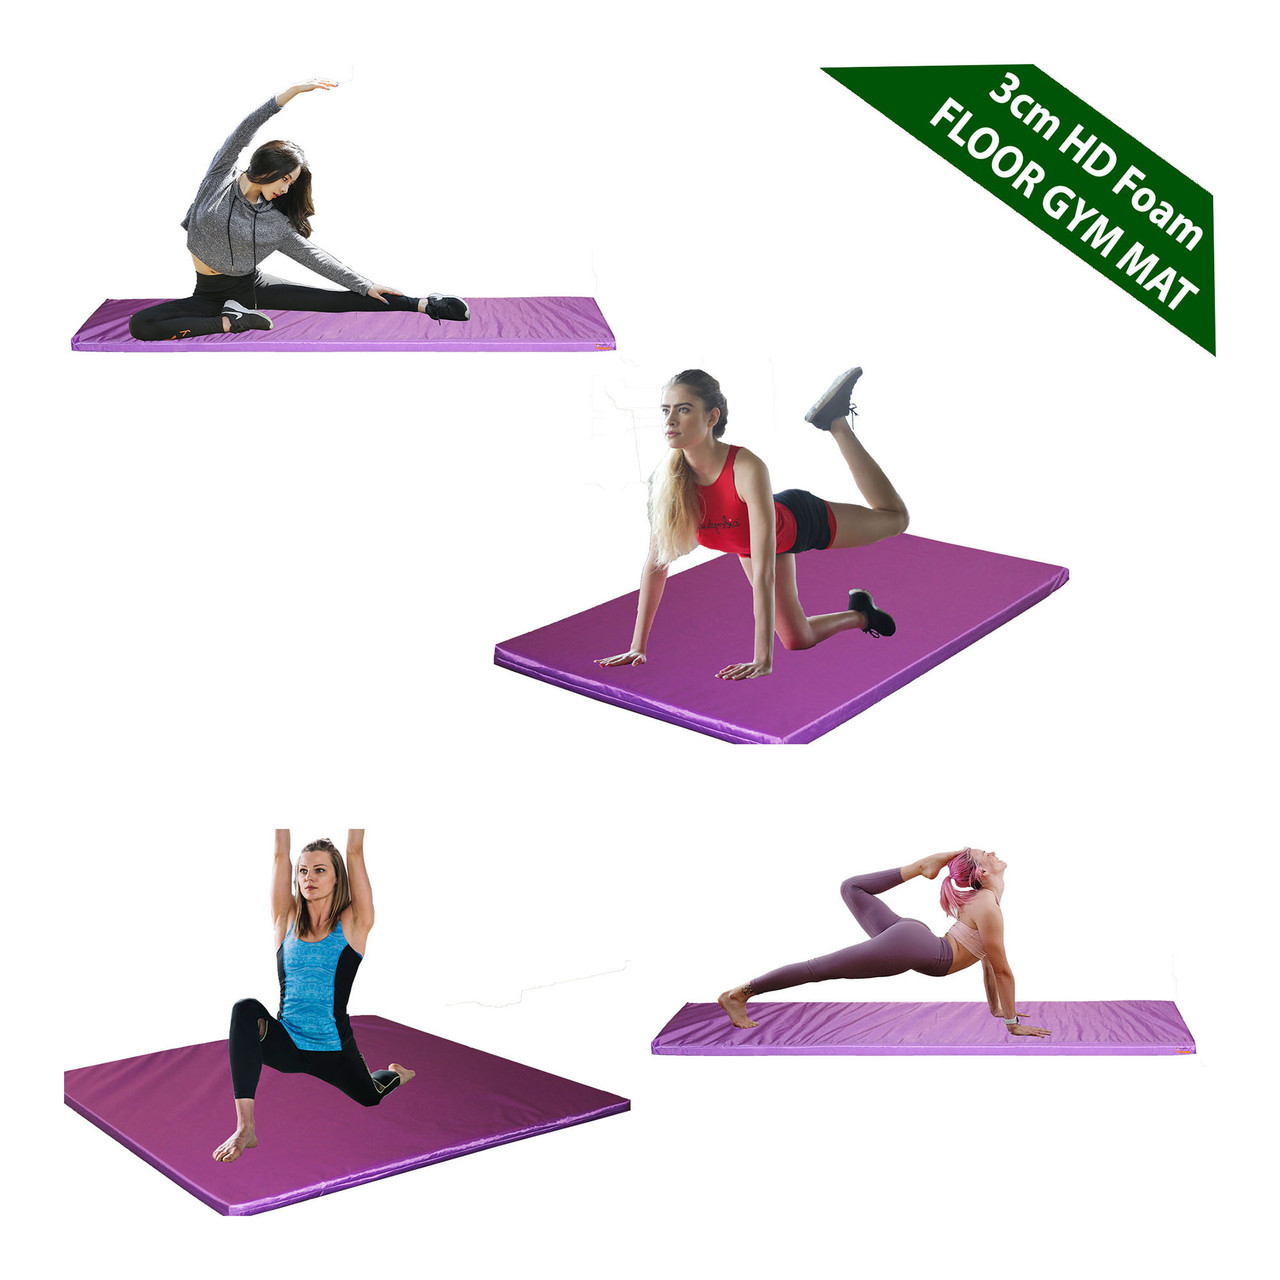 Kosipad 3cm Thick foam floor gym crash mats Purple Main